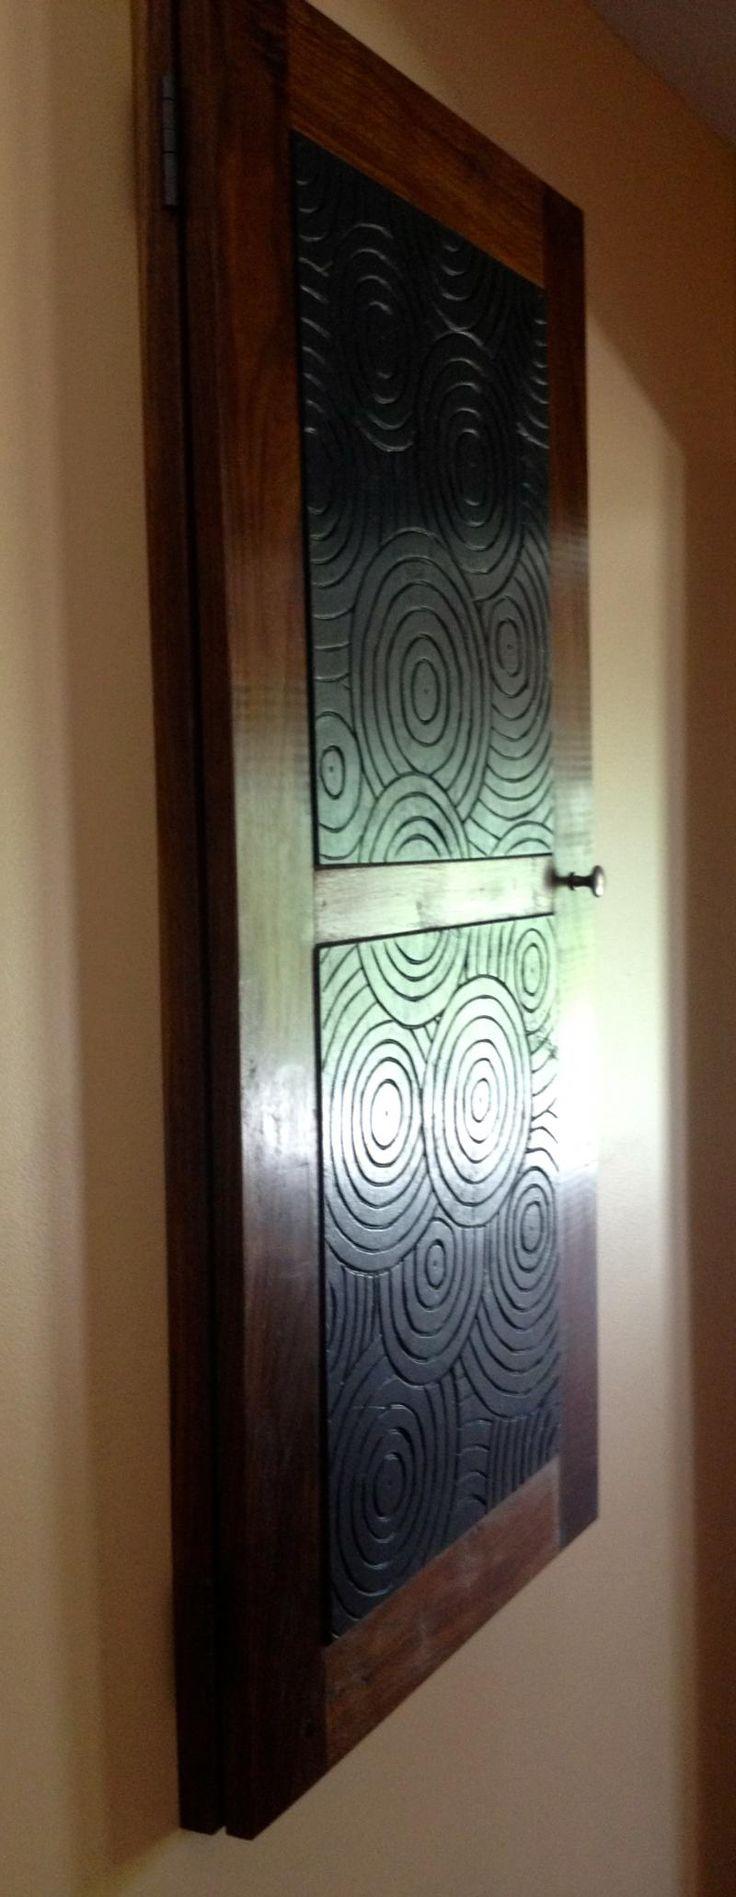 andrew gore woodworks custom work cover for breaker box  [ 736 x 1897 Pixel ]